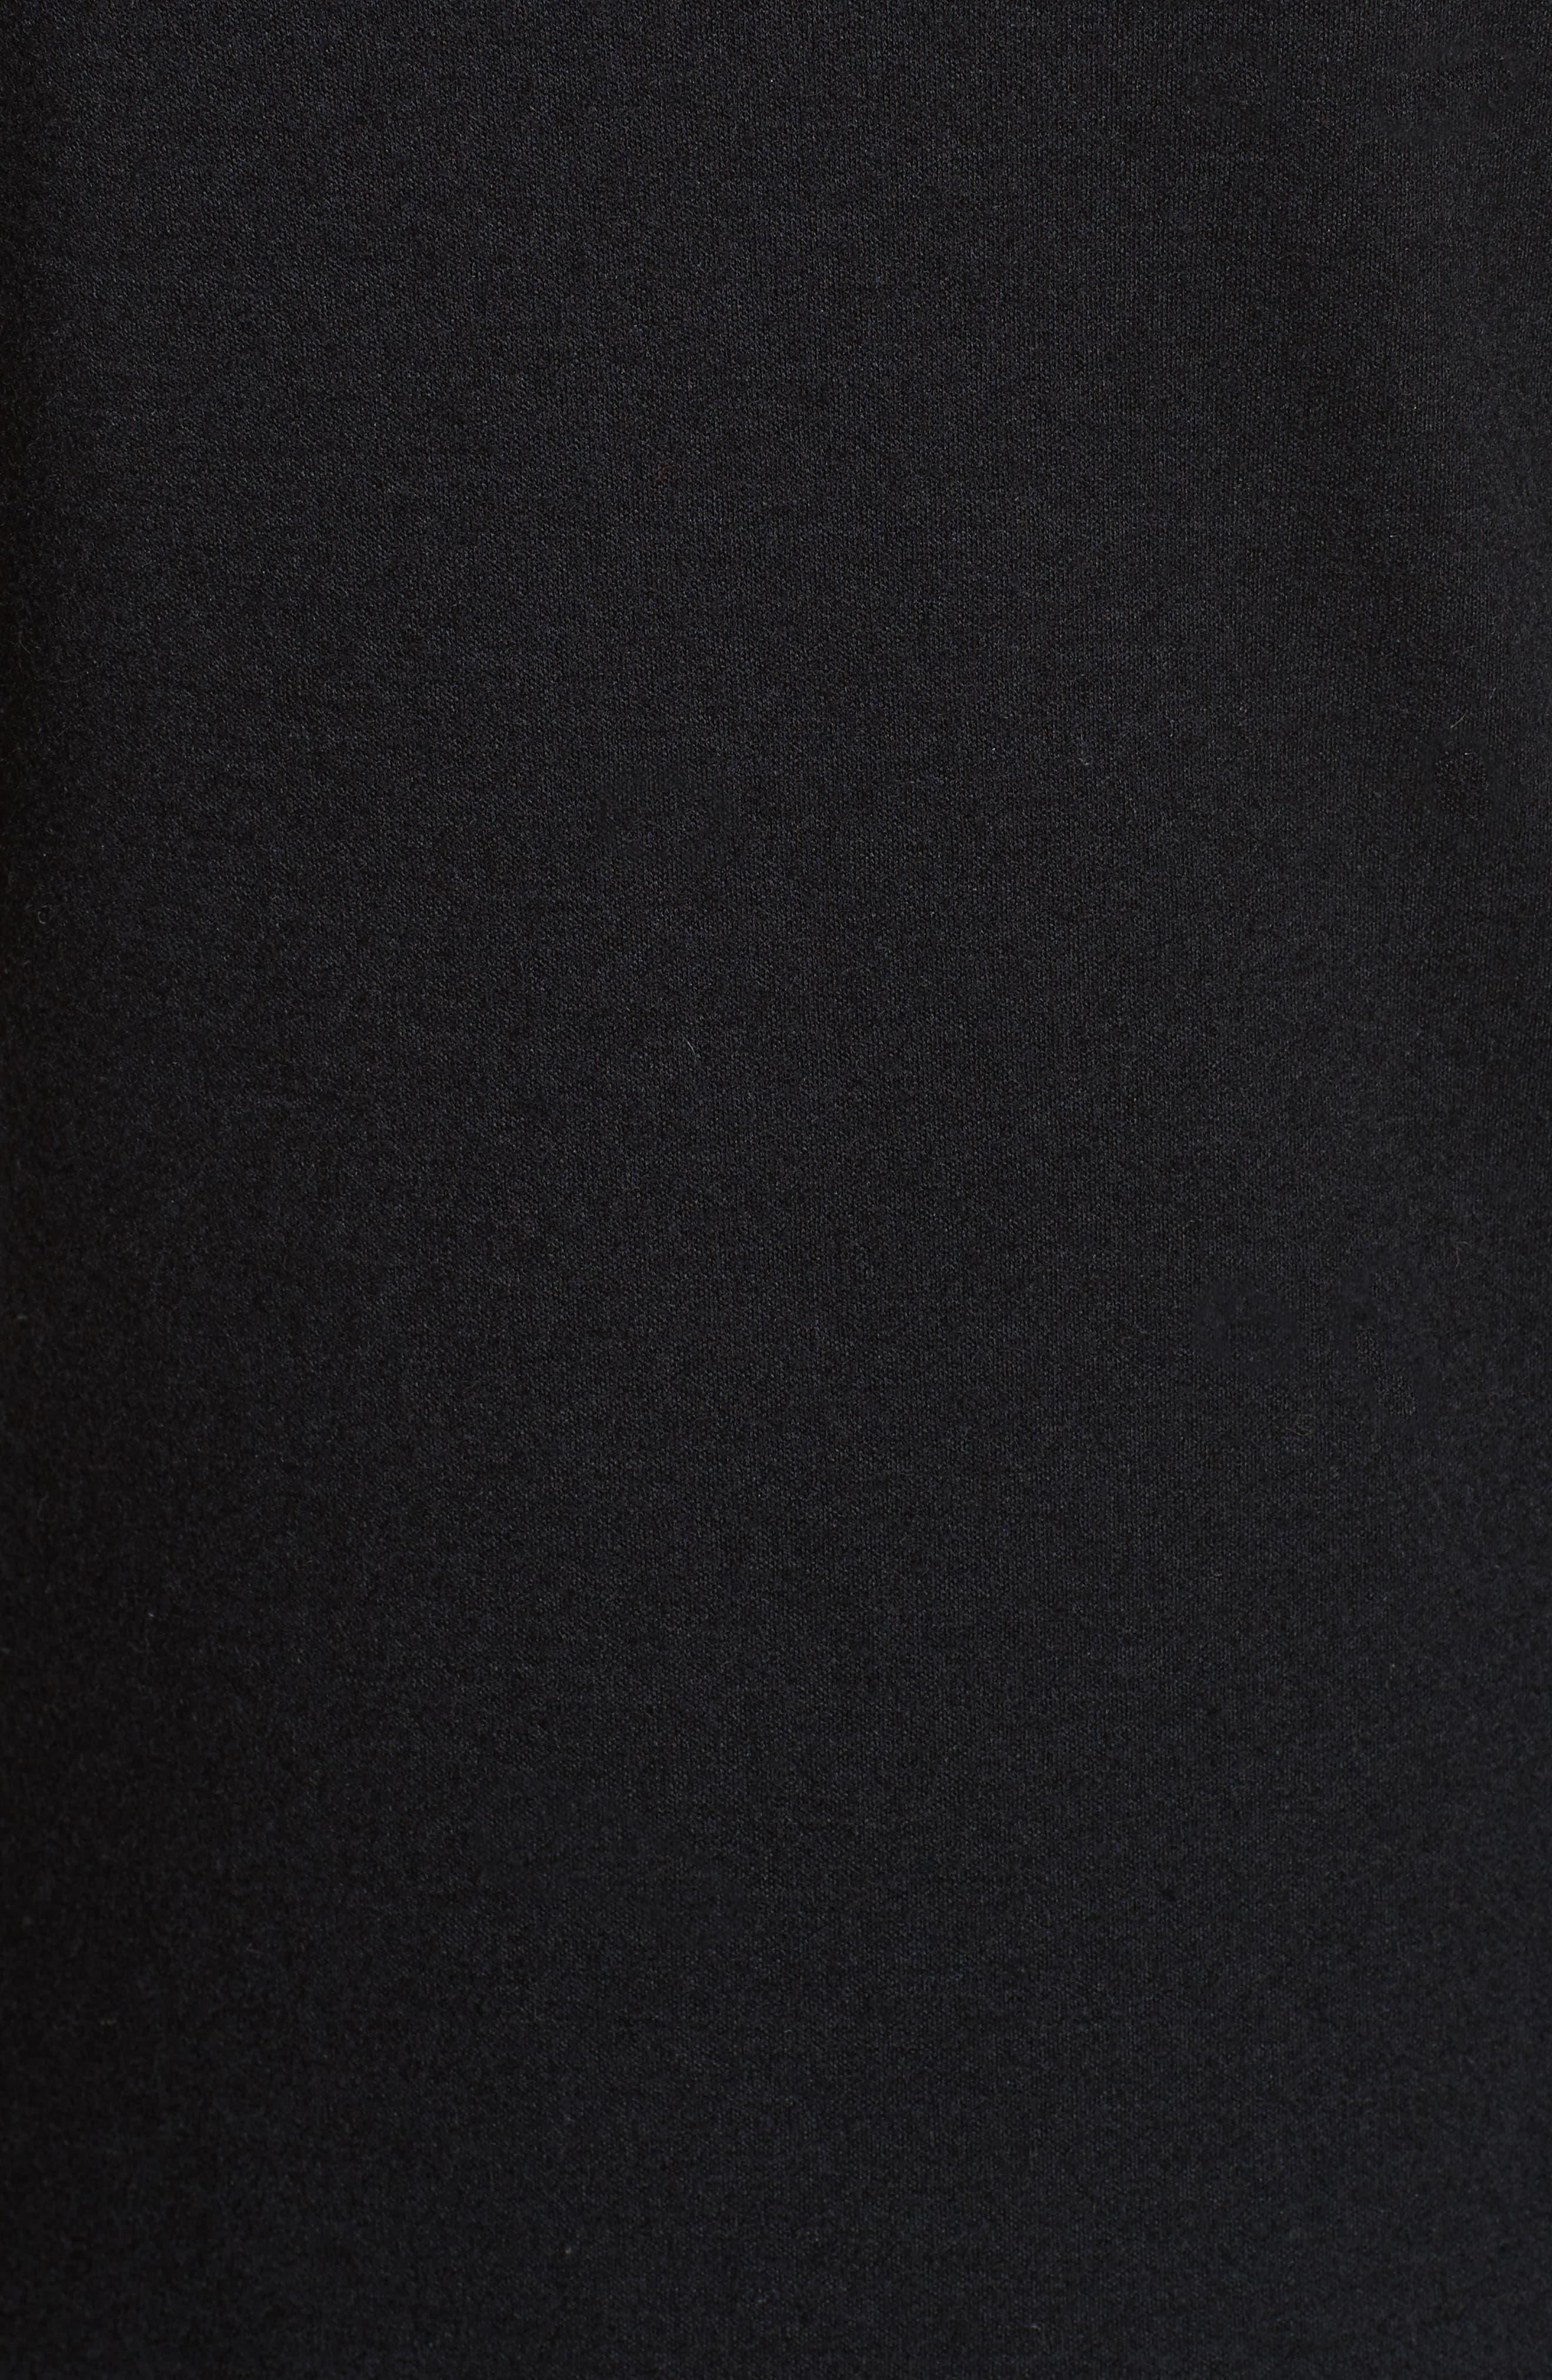 Slash Cuff Wool Blend Dress,                             Alternate thumbnail 5, color,                             Black